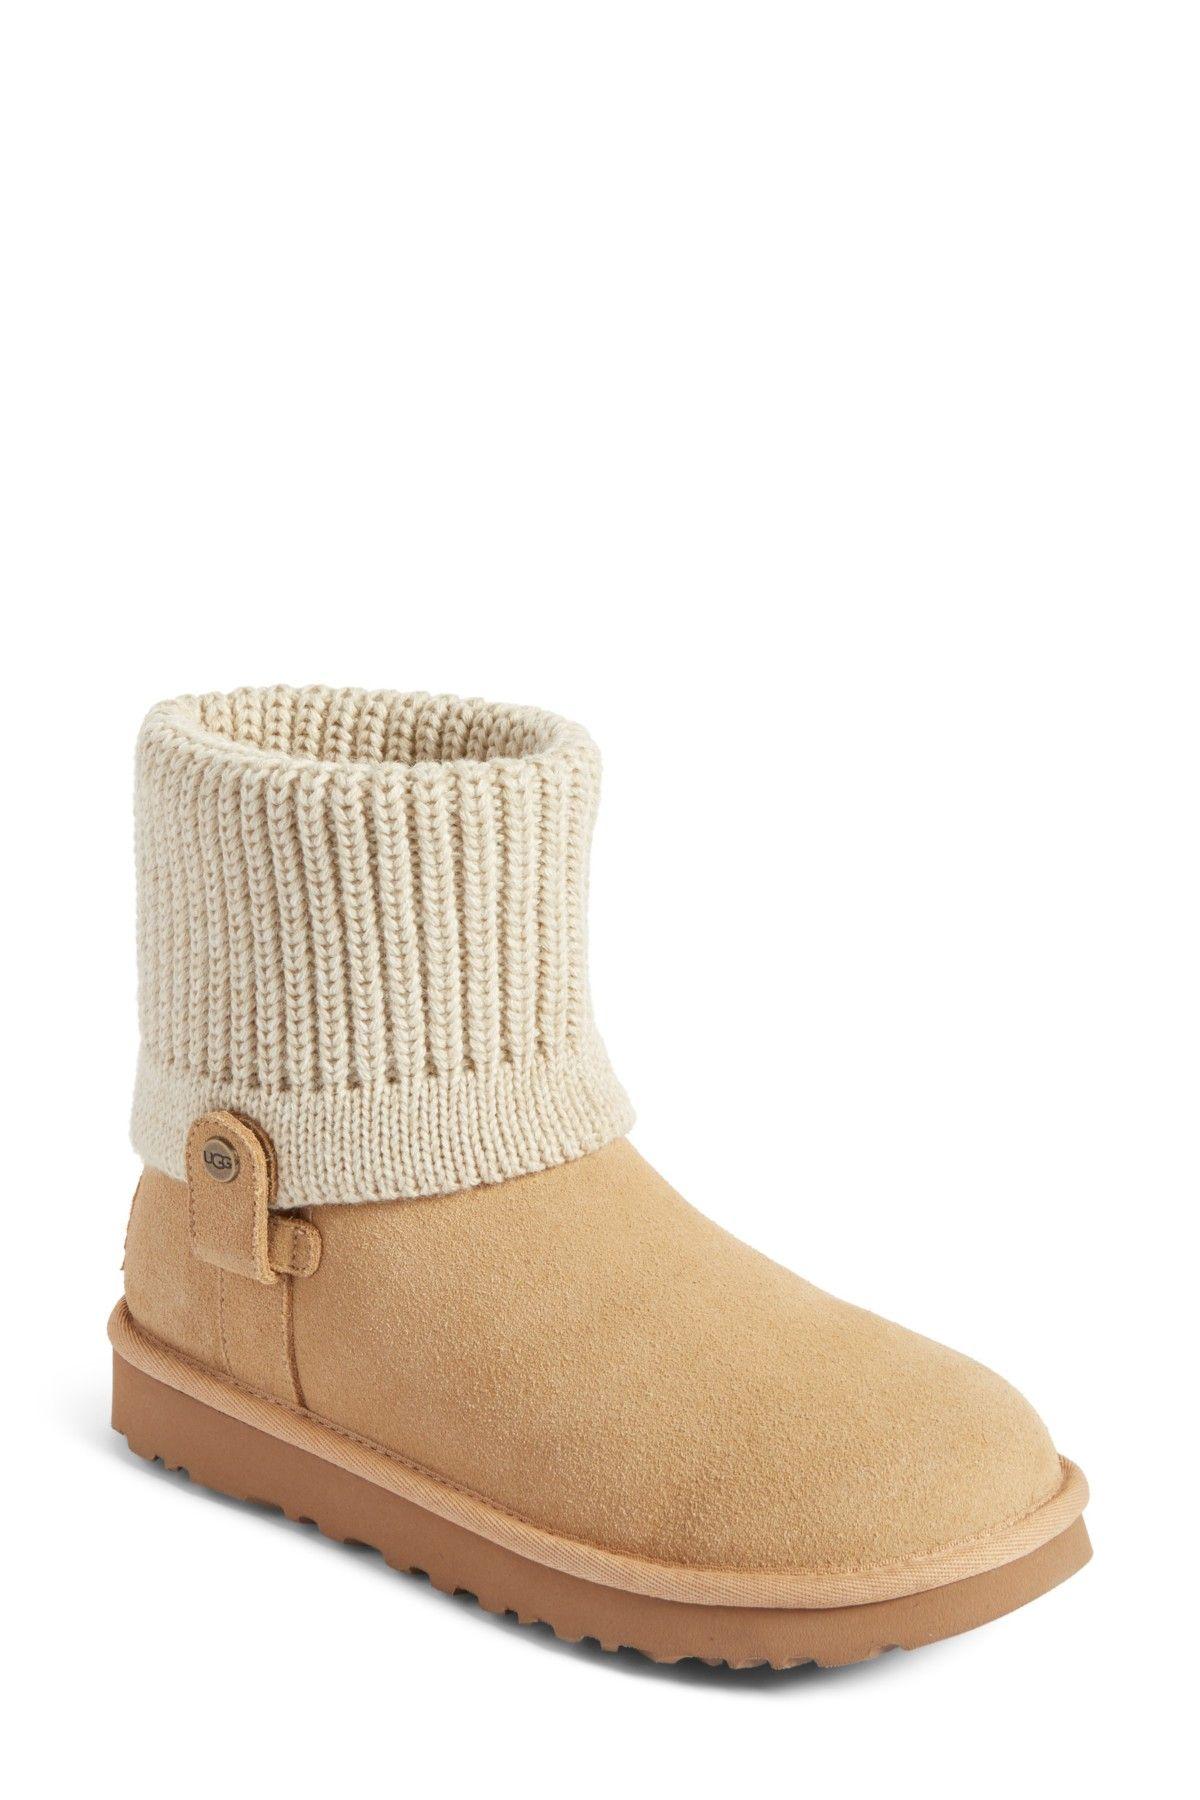 bc89e5686db Saela Rib-Knit Cuff Boot | Products | Uggs, Boots, Boot cuffs